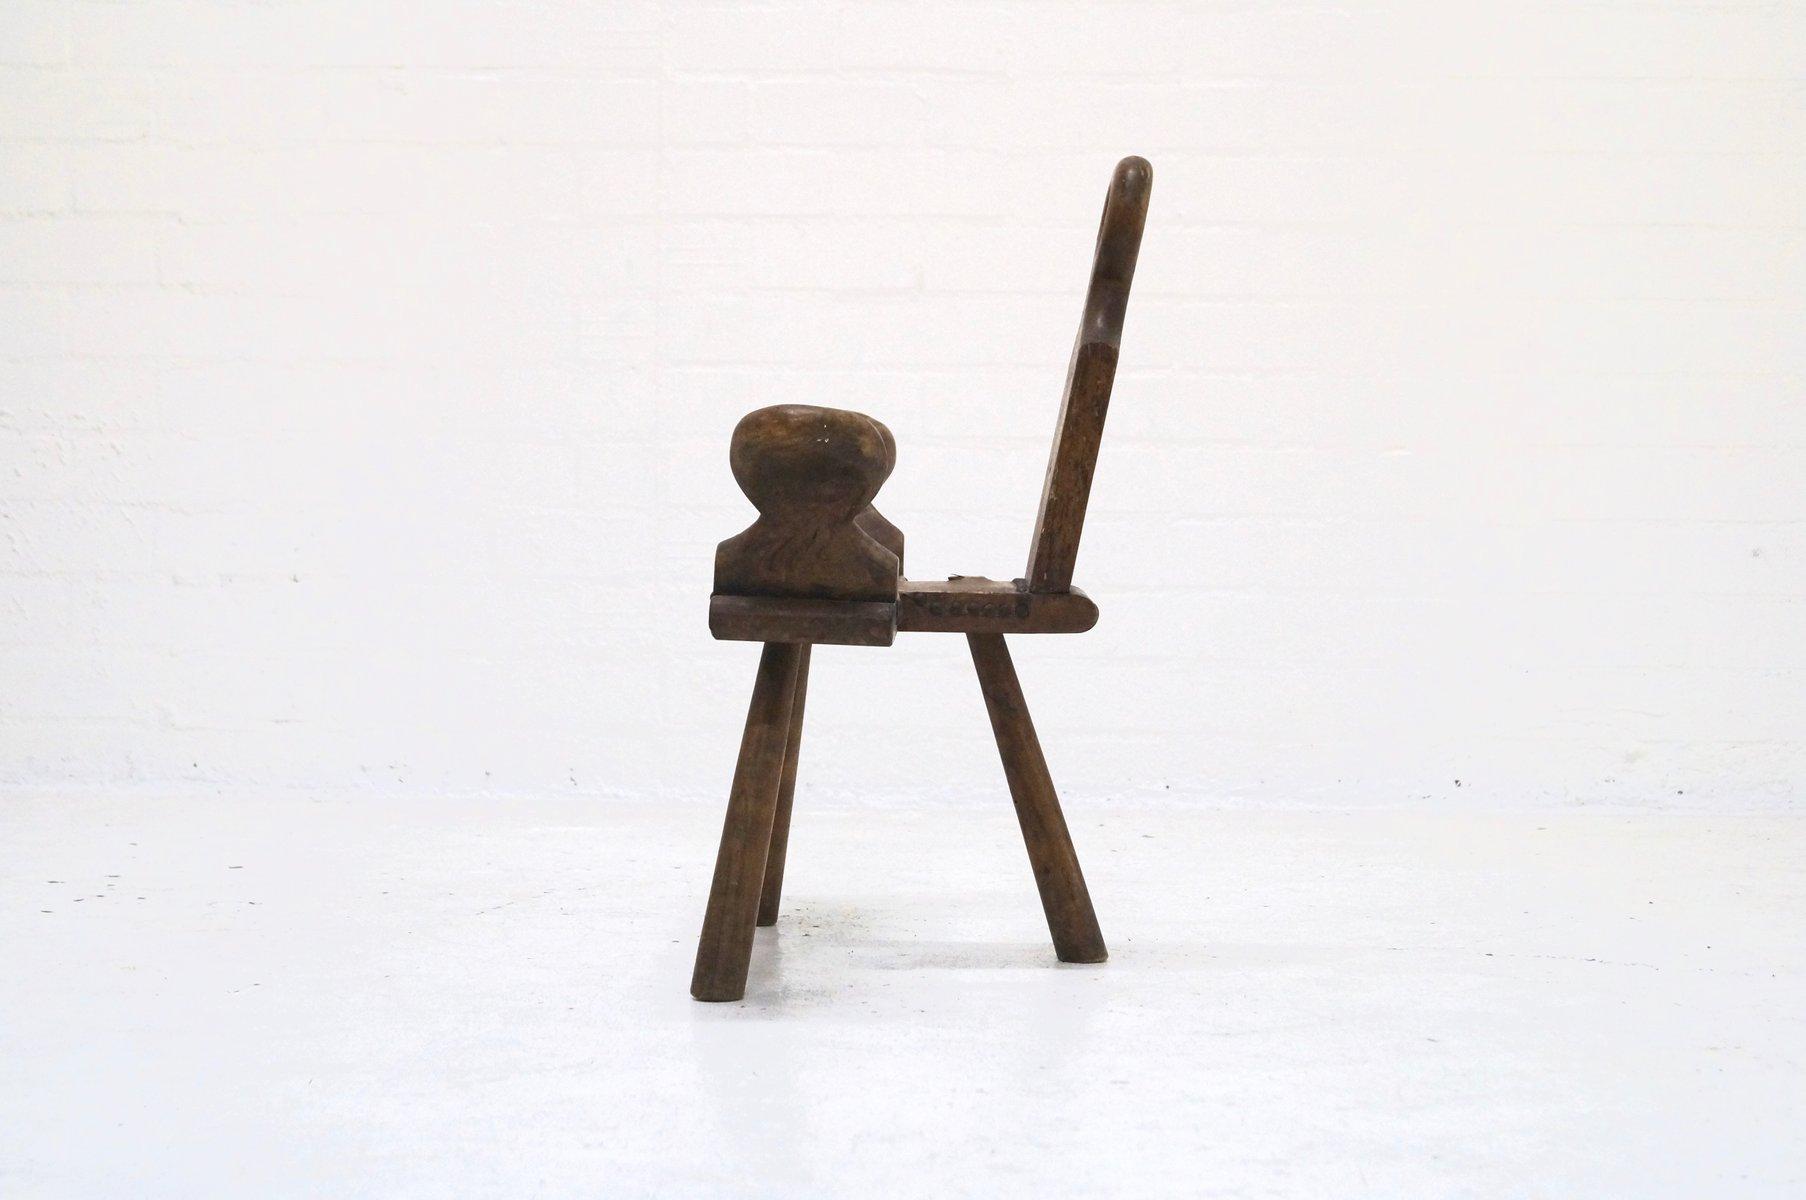 chaise d 39 appoint ou tabouret mid century brutaliste. Black Bedroom Furniture Sets. Home Design Ideas